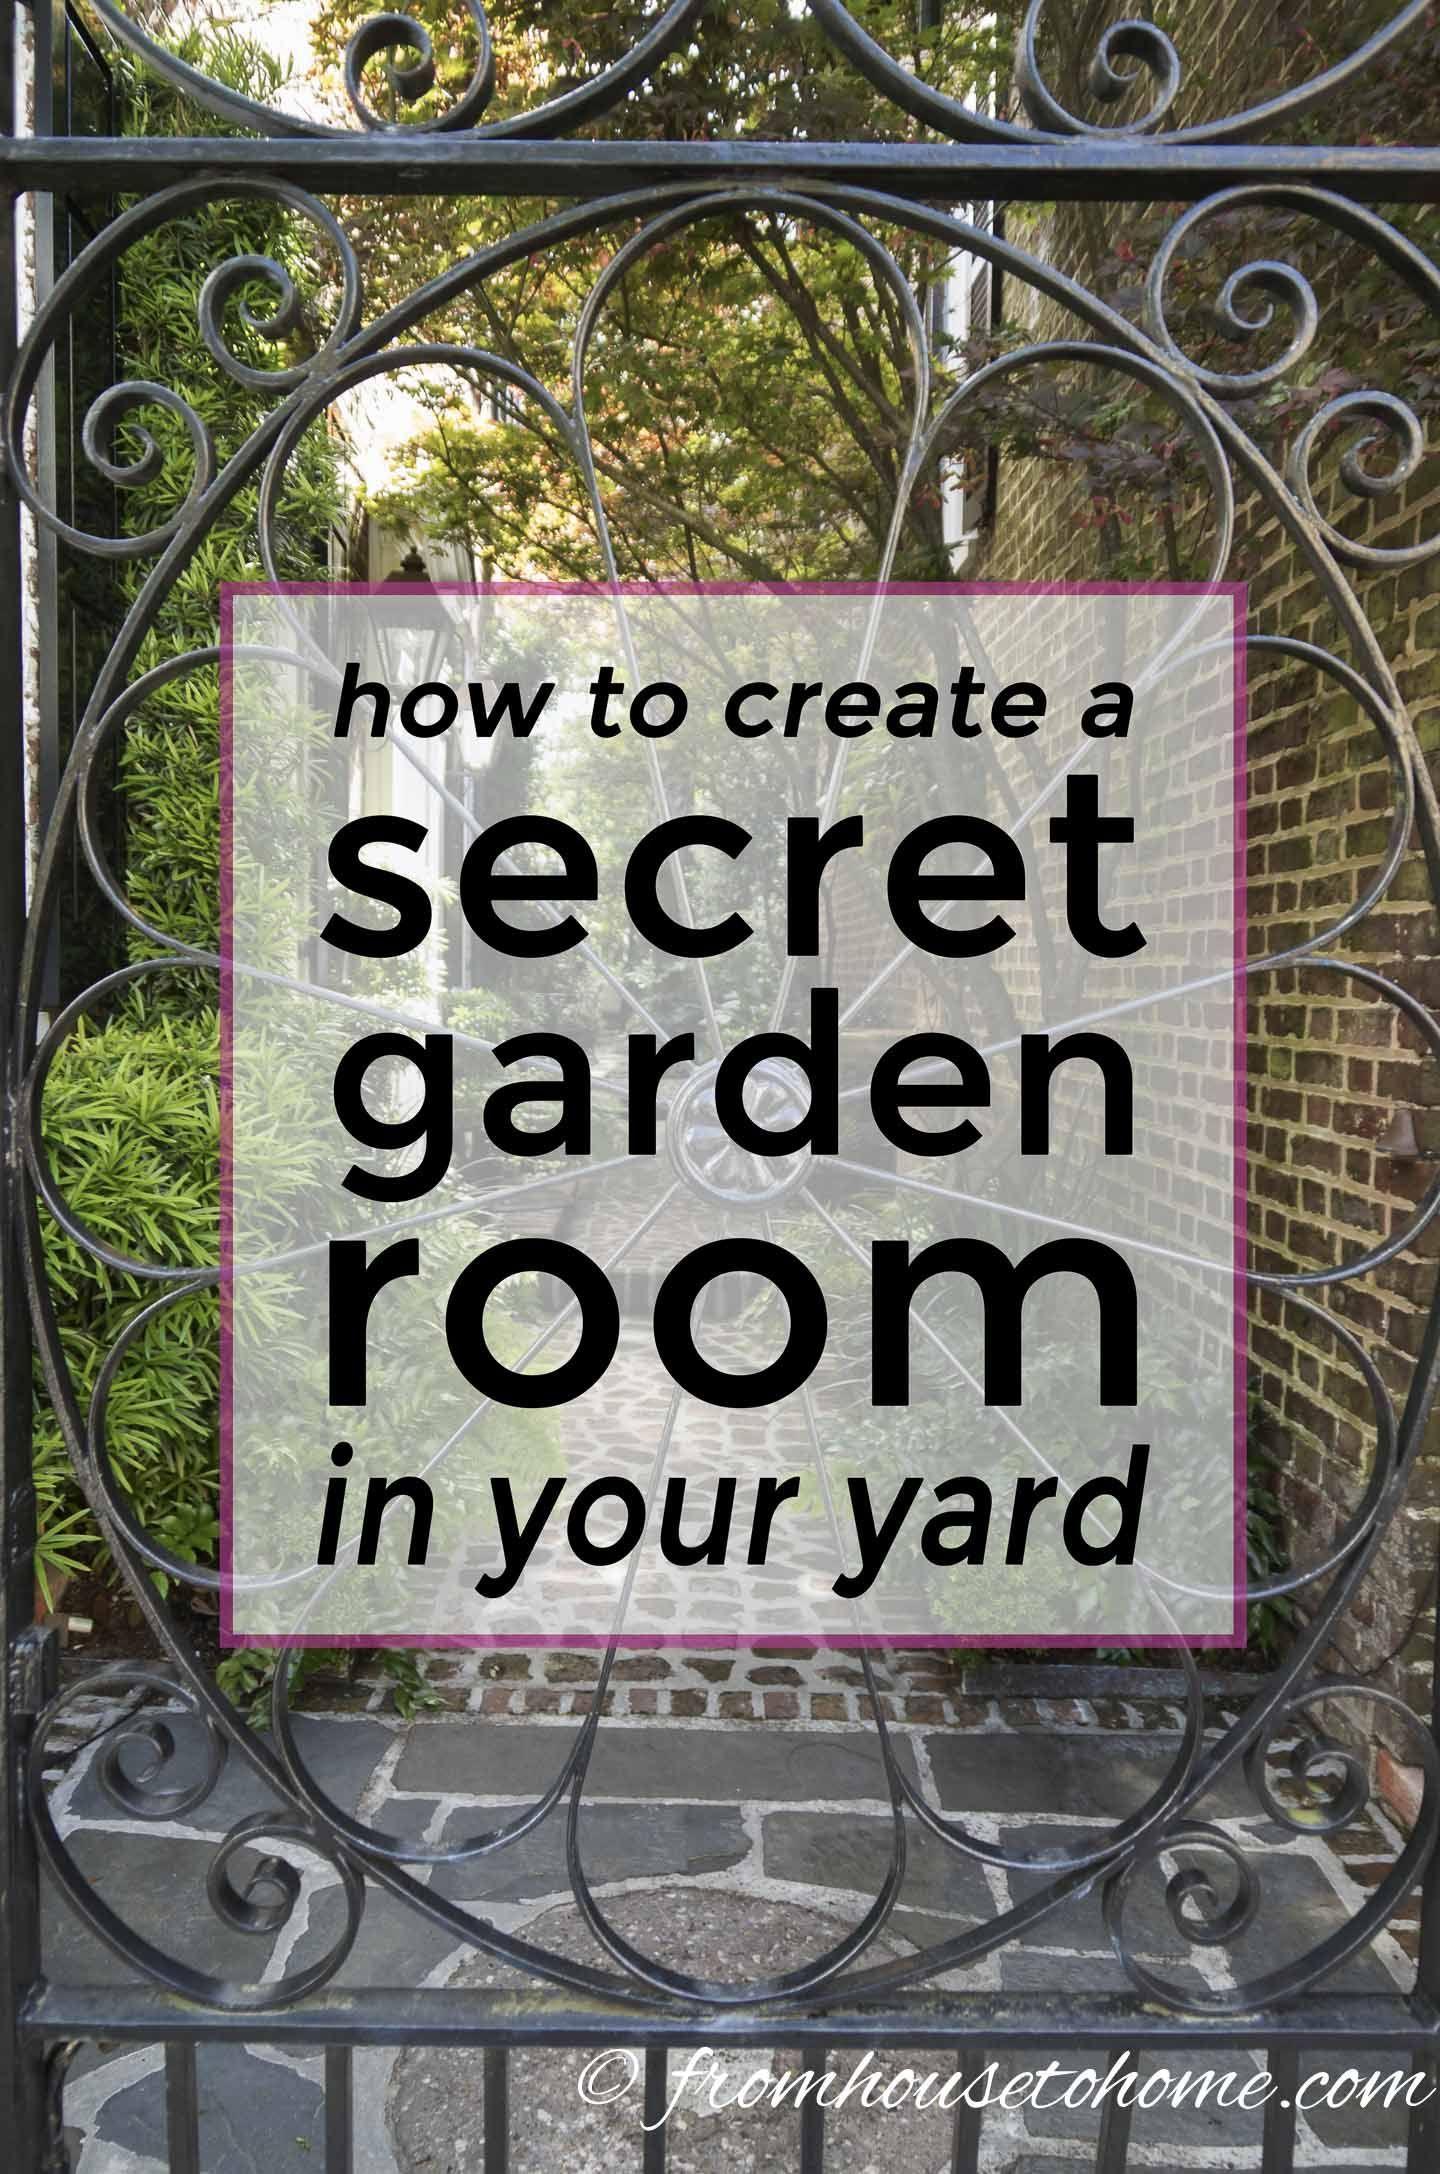 Veggie garden inspiration  Secret Garden Design Ideas How To Create Your Own Secret Garden